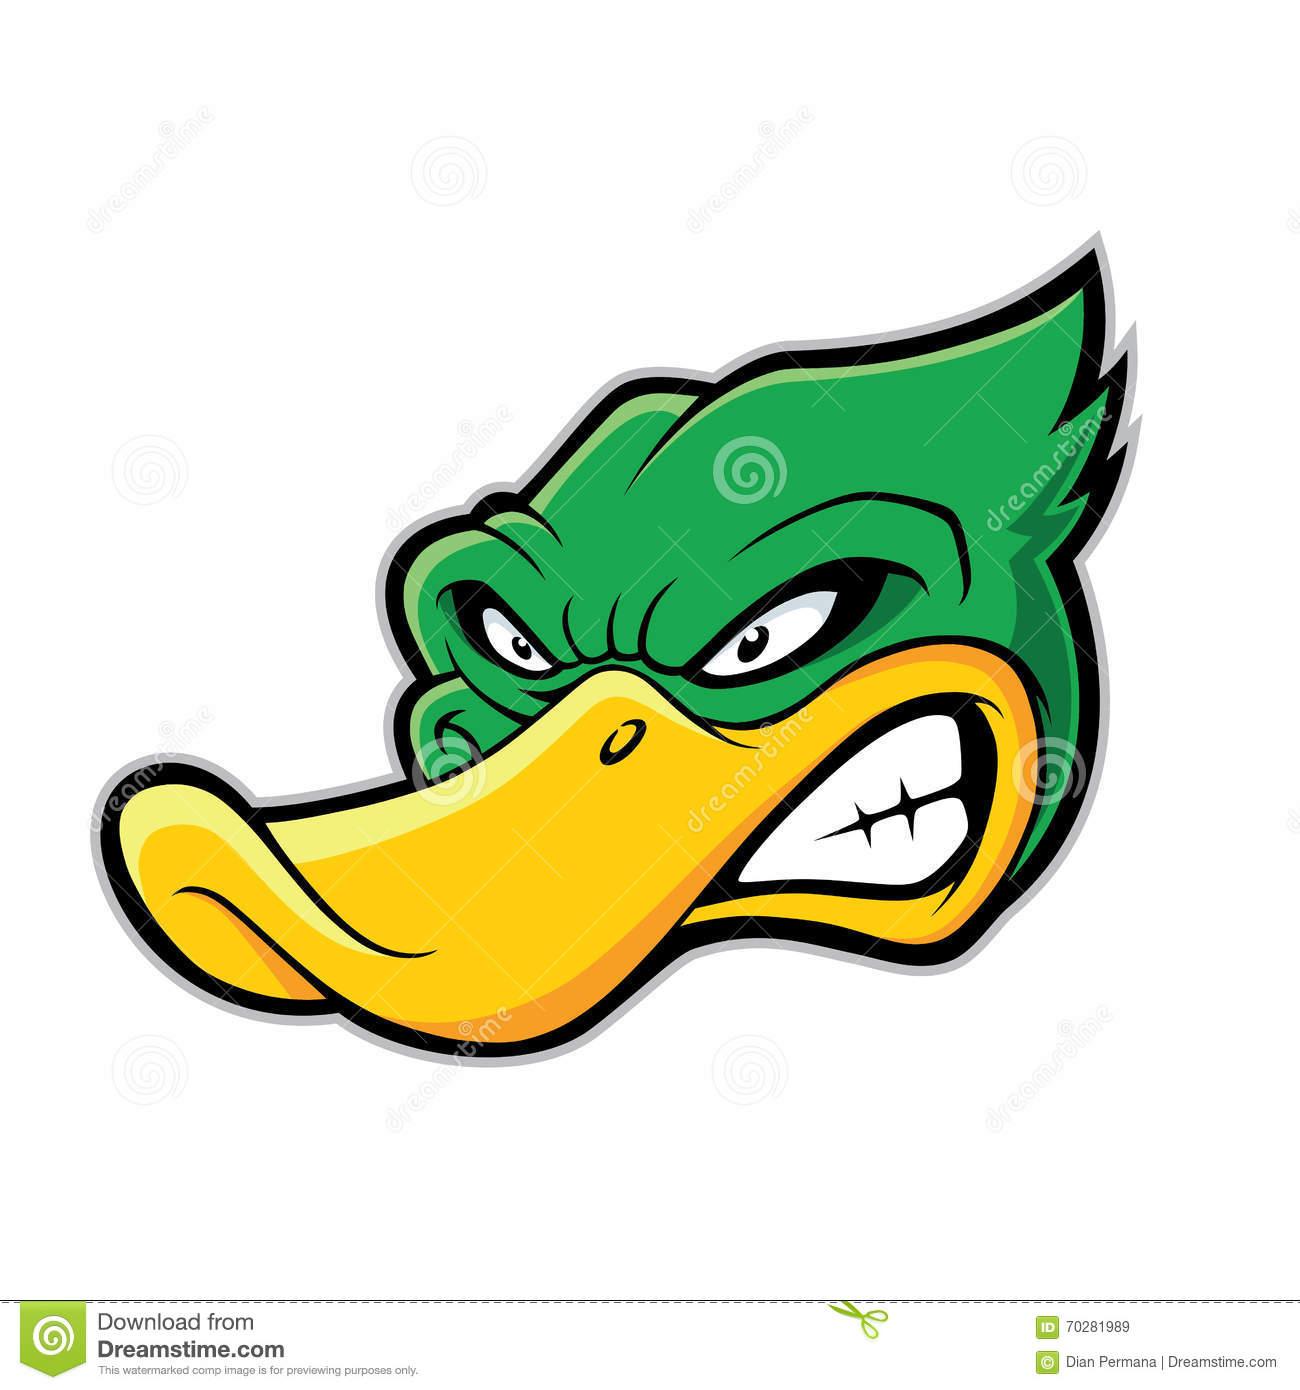 Duck head mascot stock vector. Illustration of head, face.